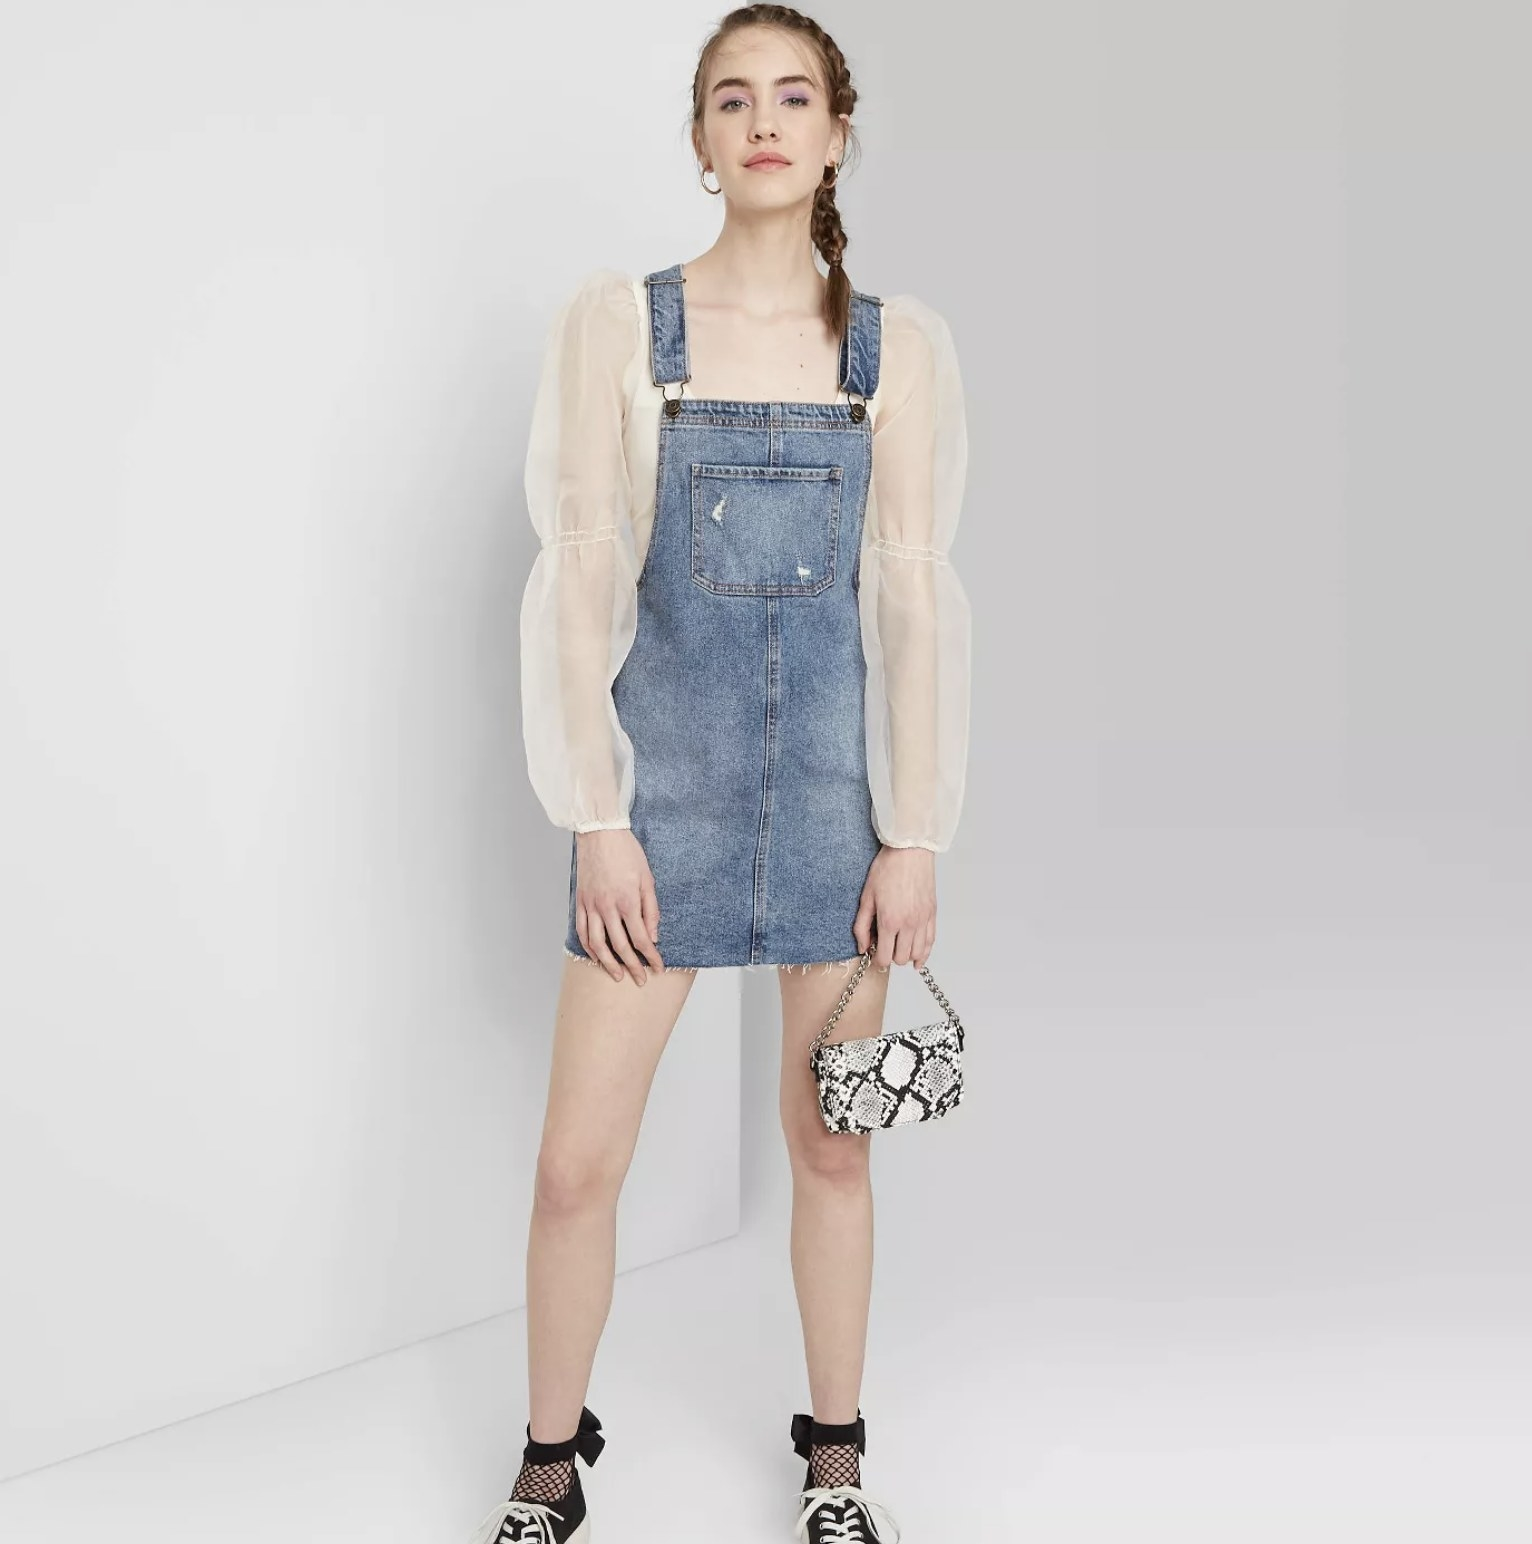 model wearing denim mini dress